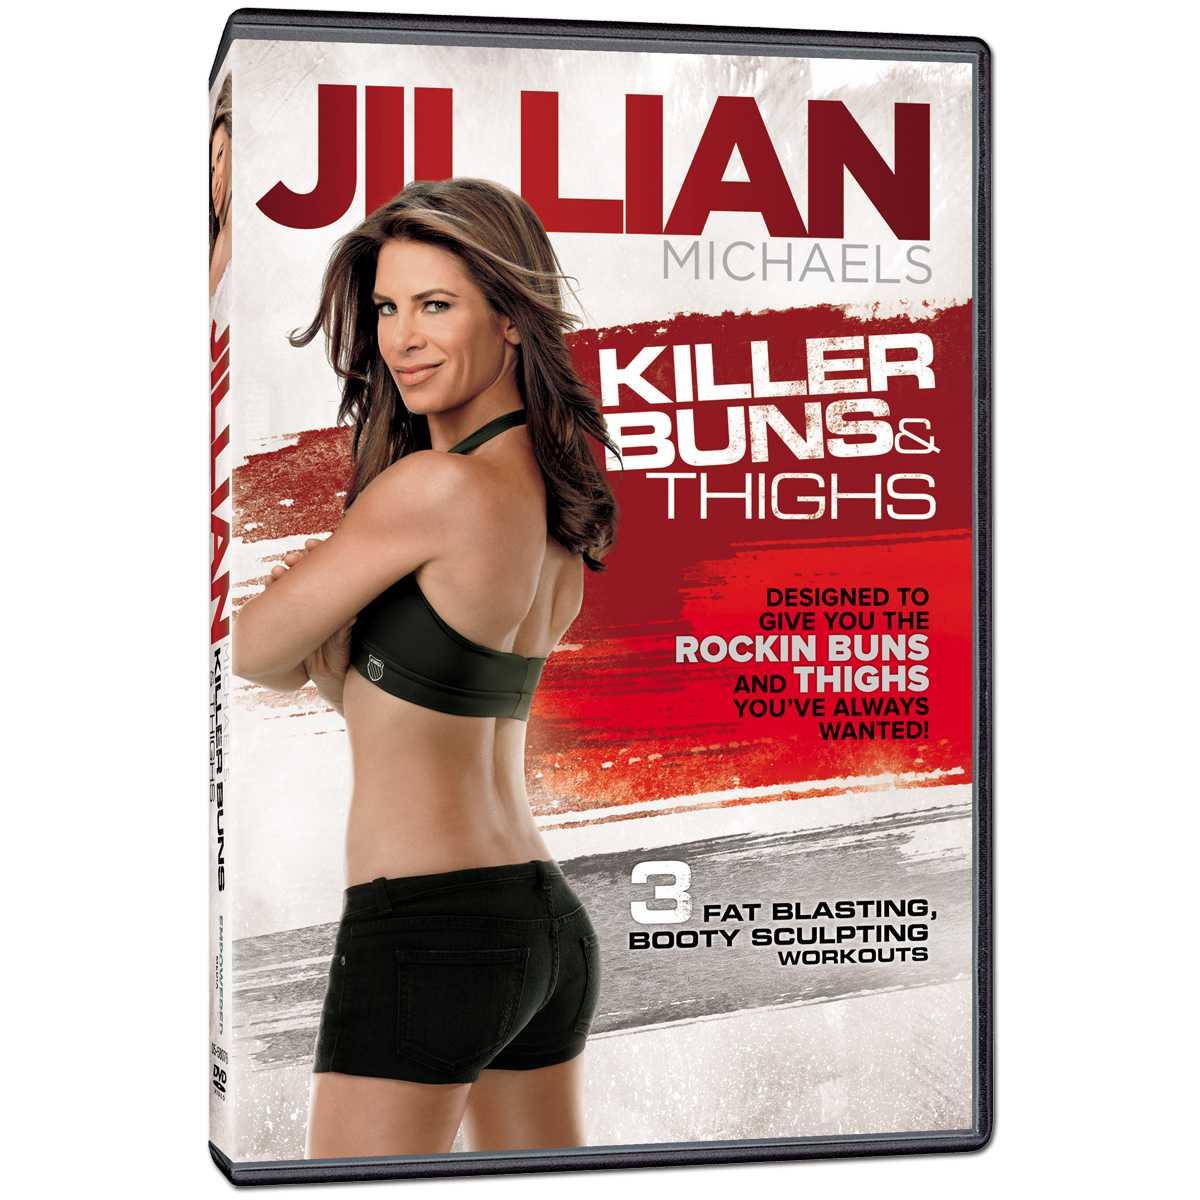 Killer Arms & Back с Джиллиан Майклс: обзор программы